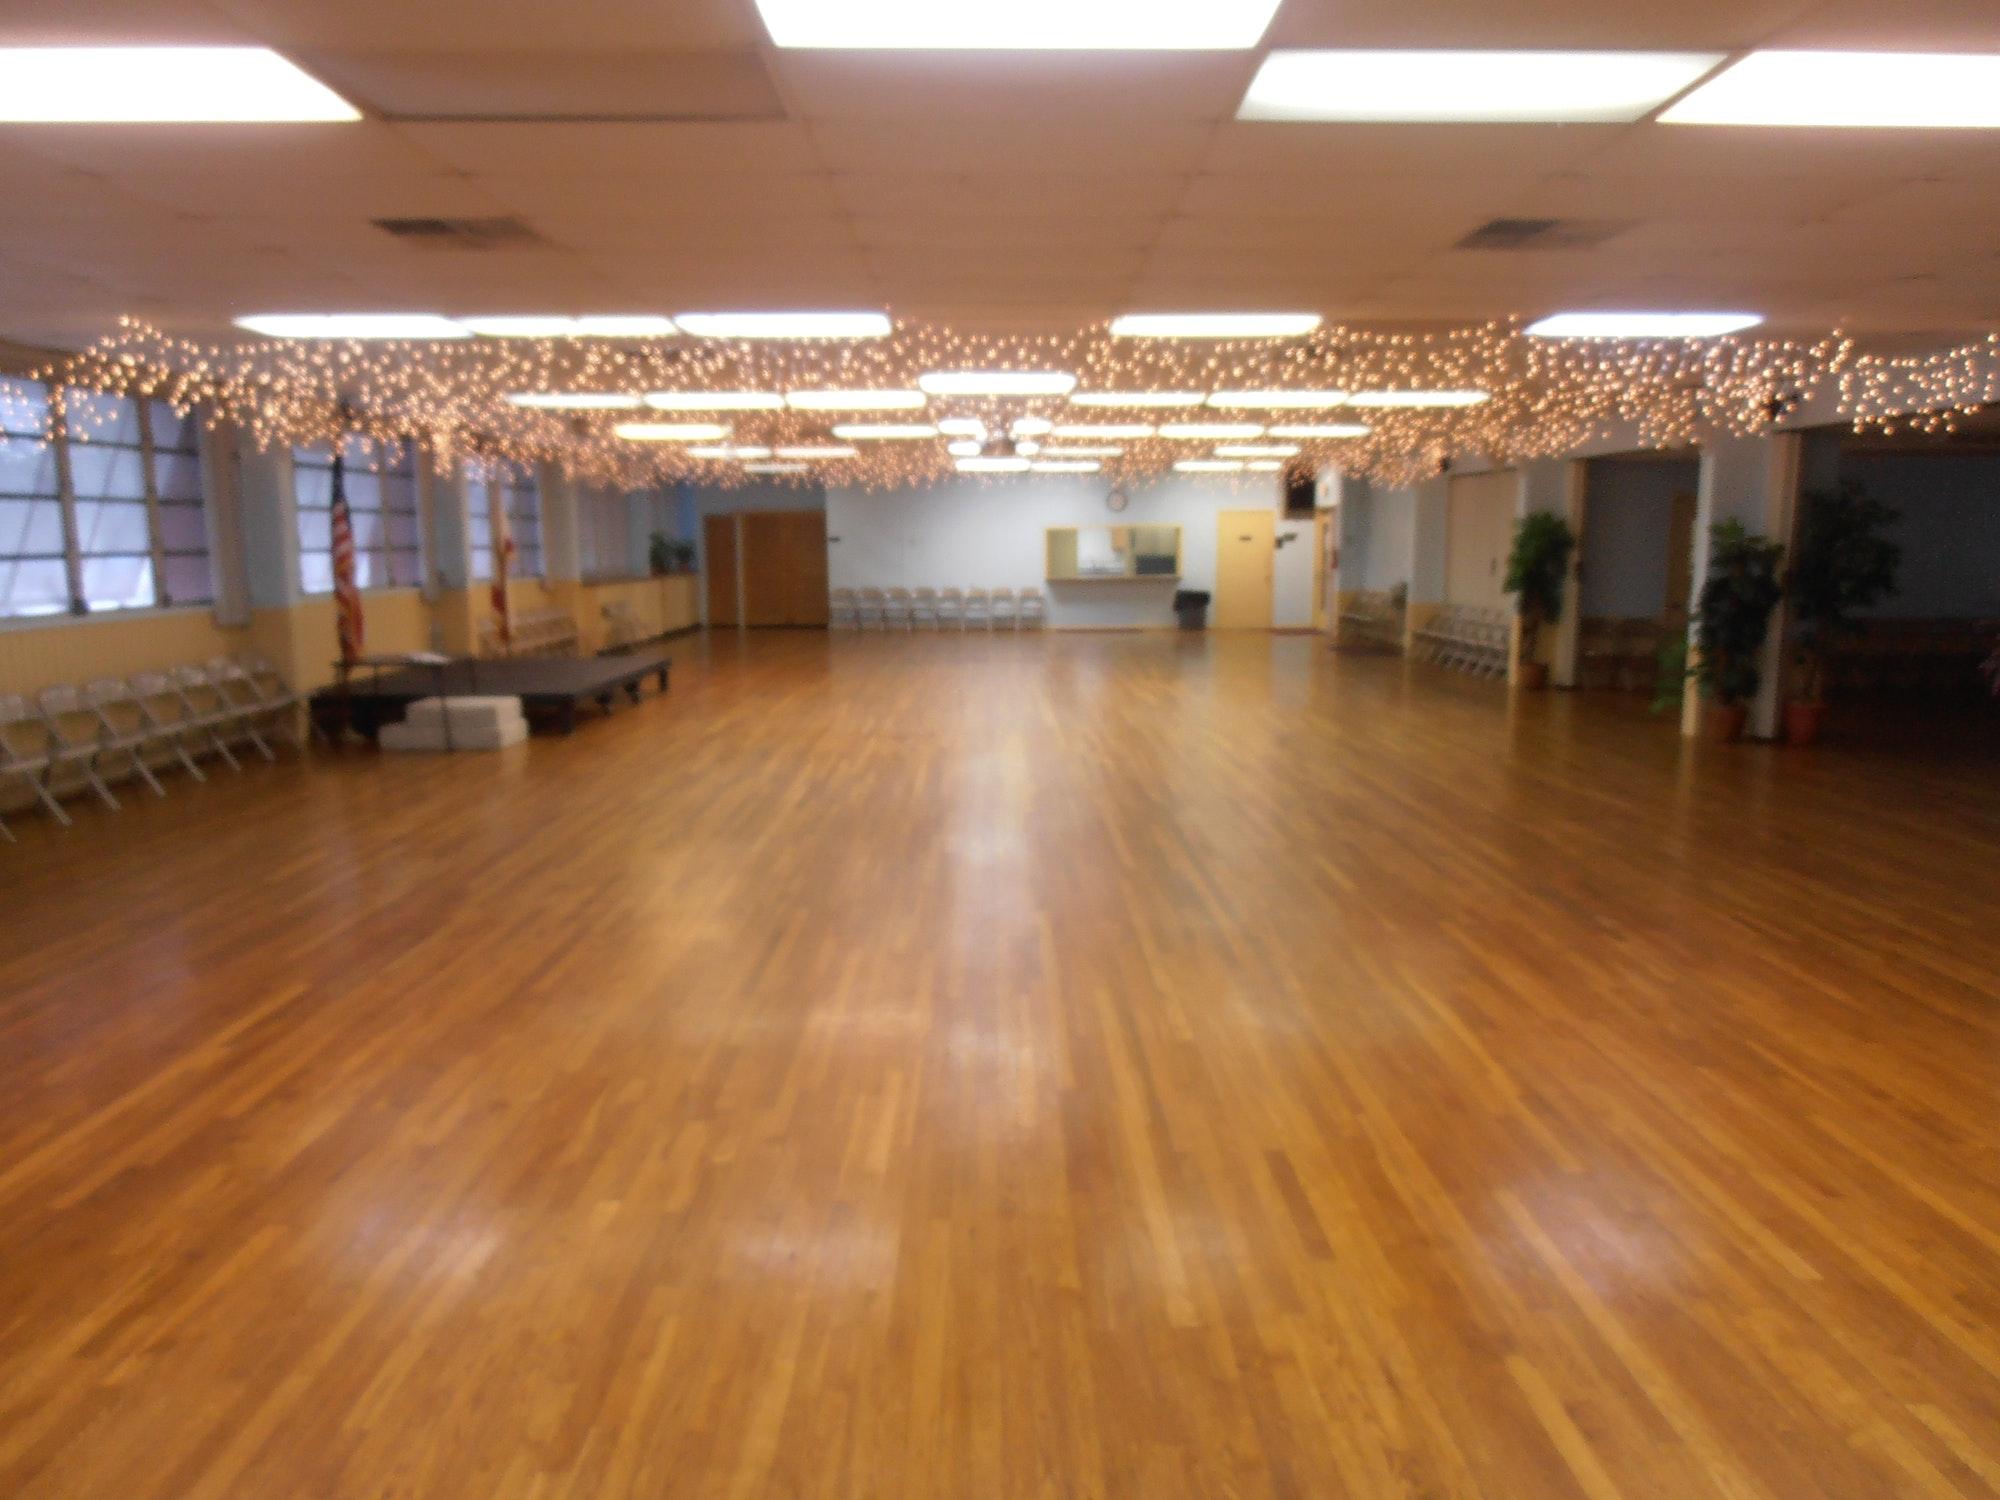 May contain: floor, person, human, flooring, wood, indoors, hardwood, and room